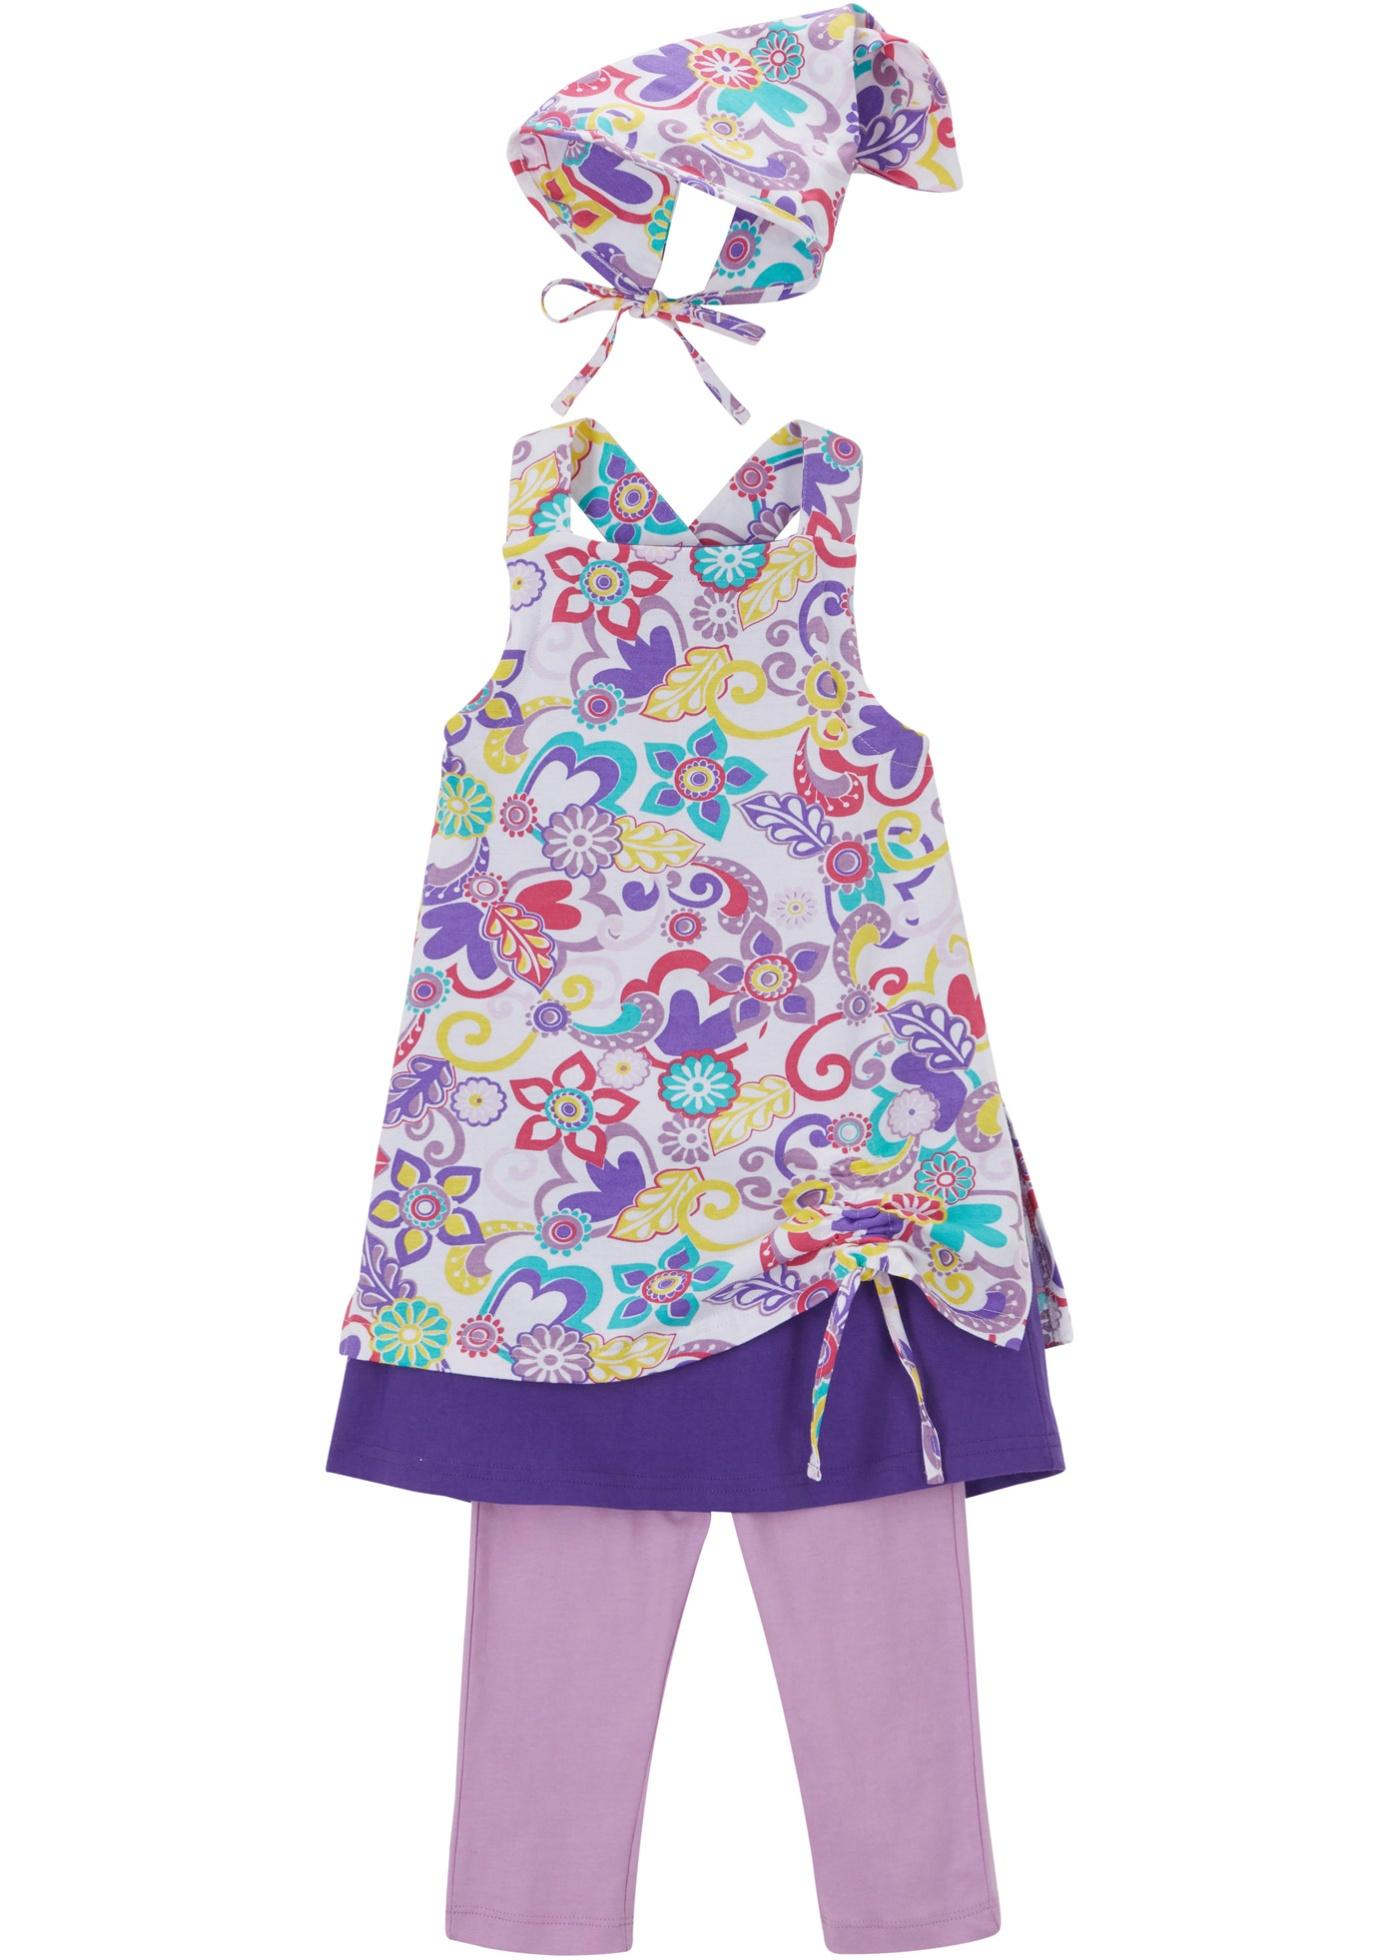 Robe fille, legging, foulard (Ens. 3 pces.)